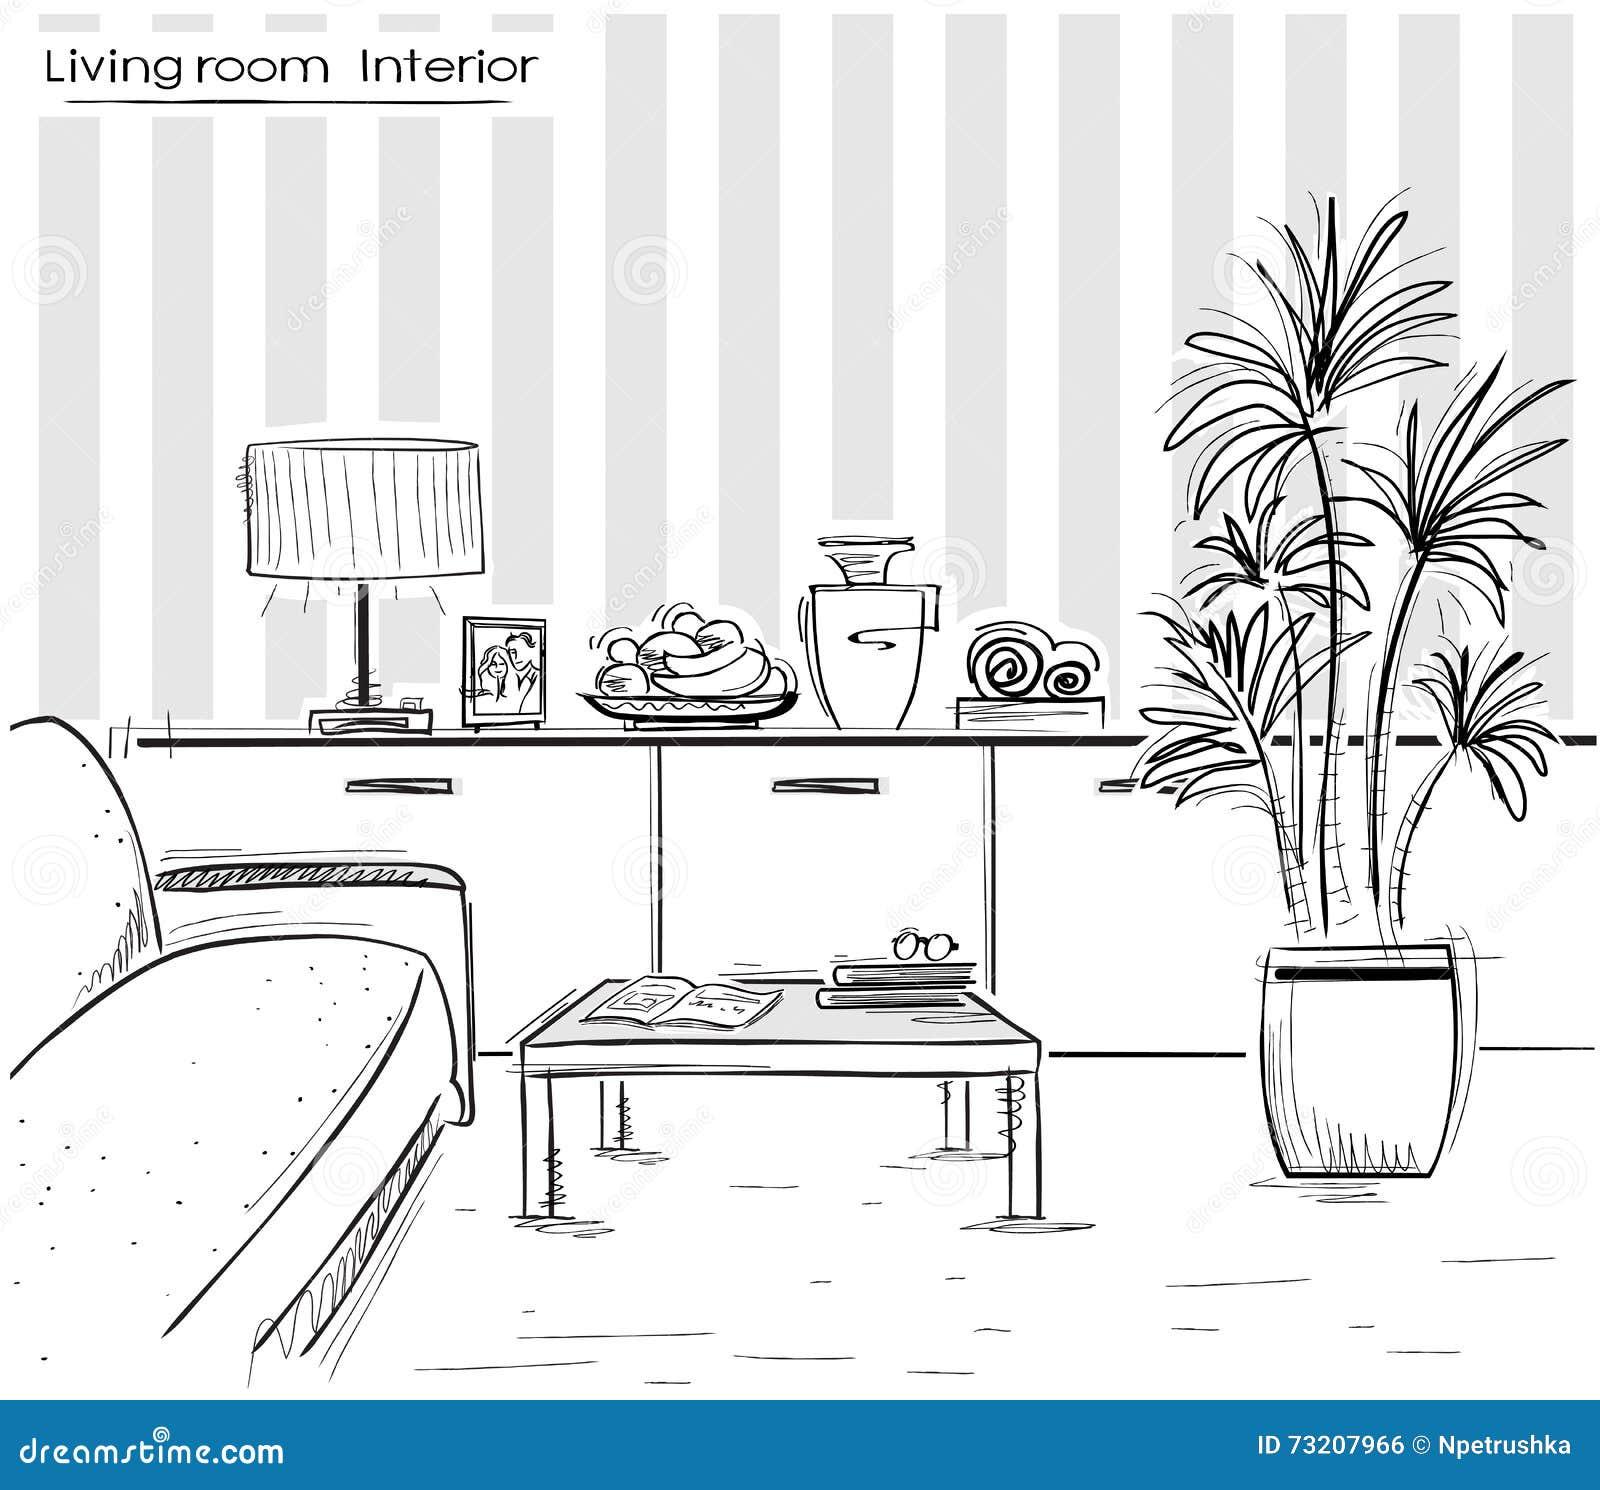 Interior del dise o de la sala de estar illust del dibujo for Sala de estar dibujo